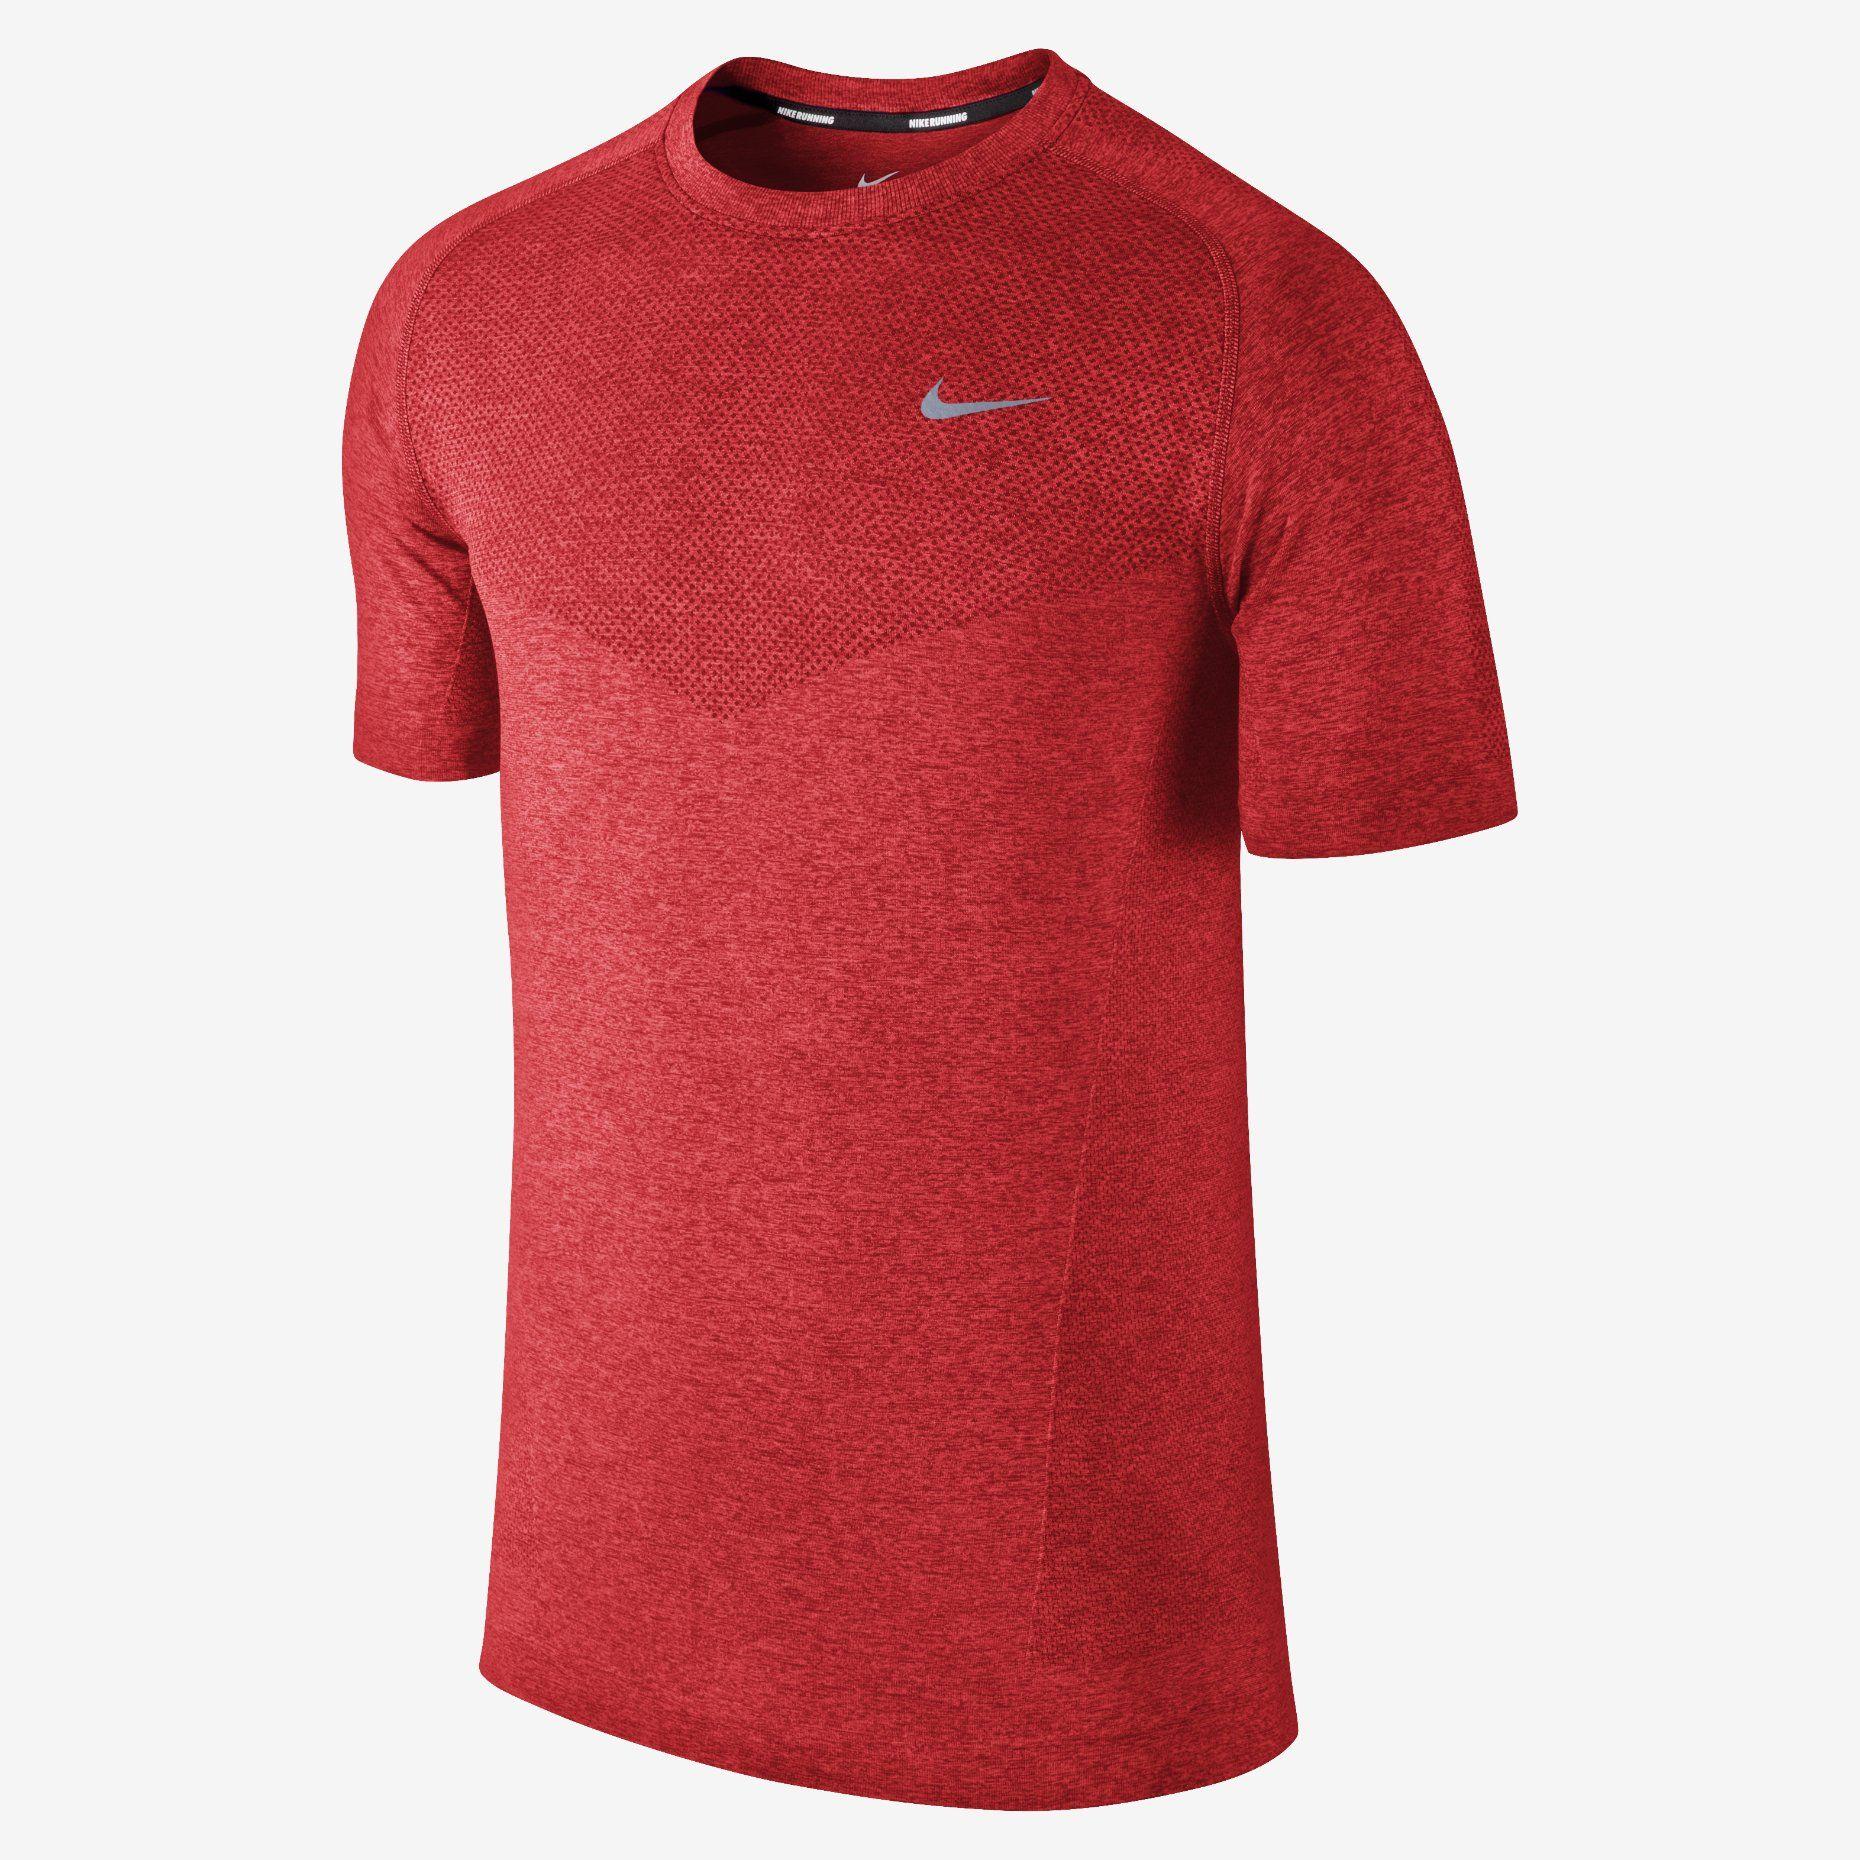 competencia O Interpretativo  Look what I found at Nike online. | Mens running shirts, Running shirts,  Running shorts outfit